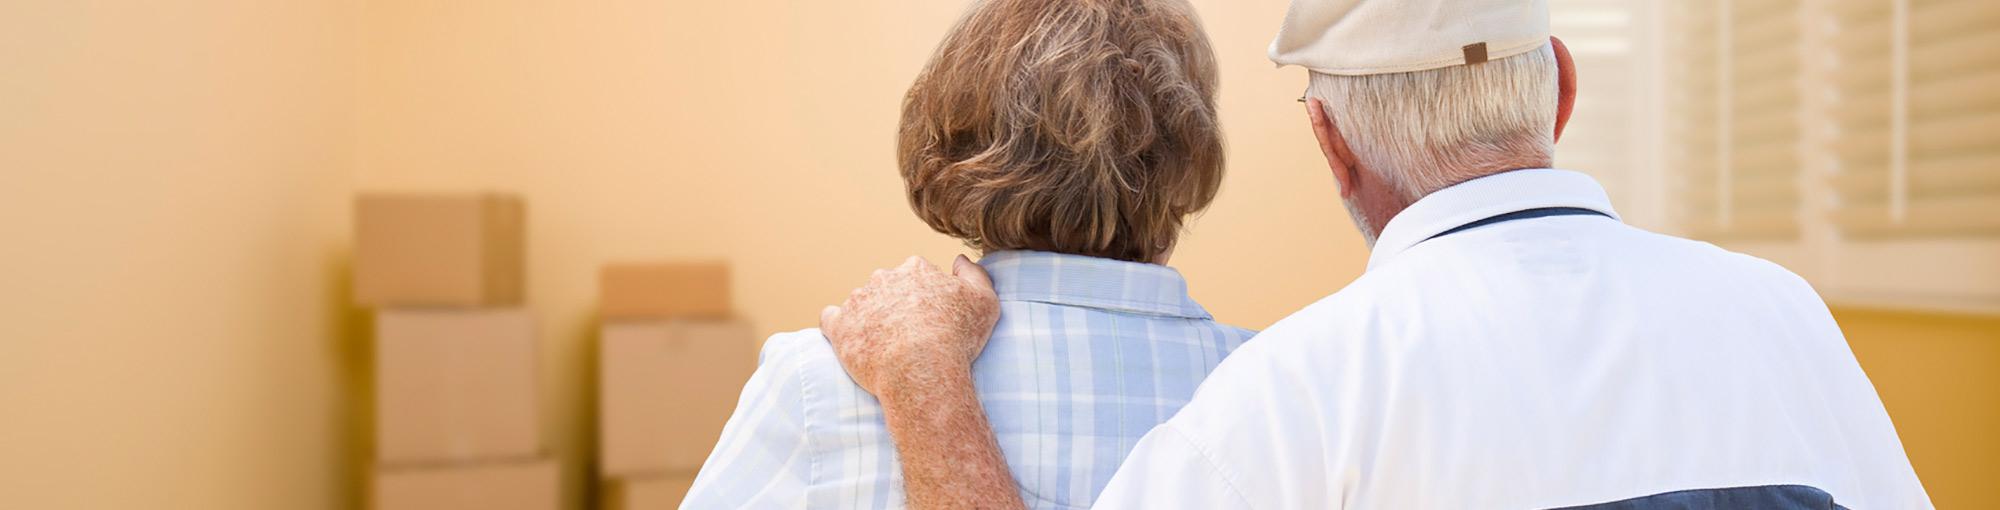 Senior Couple Moving to Retirement Community